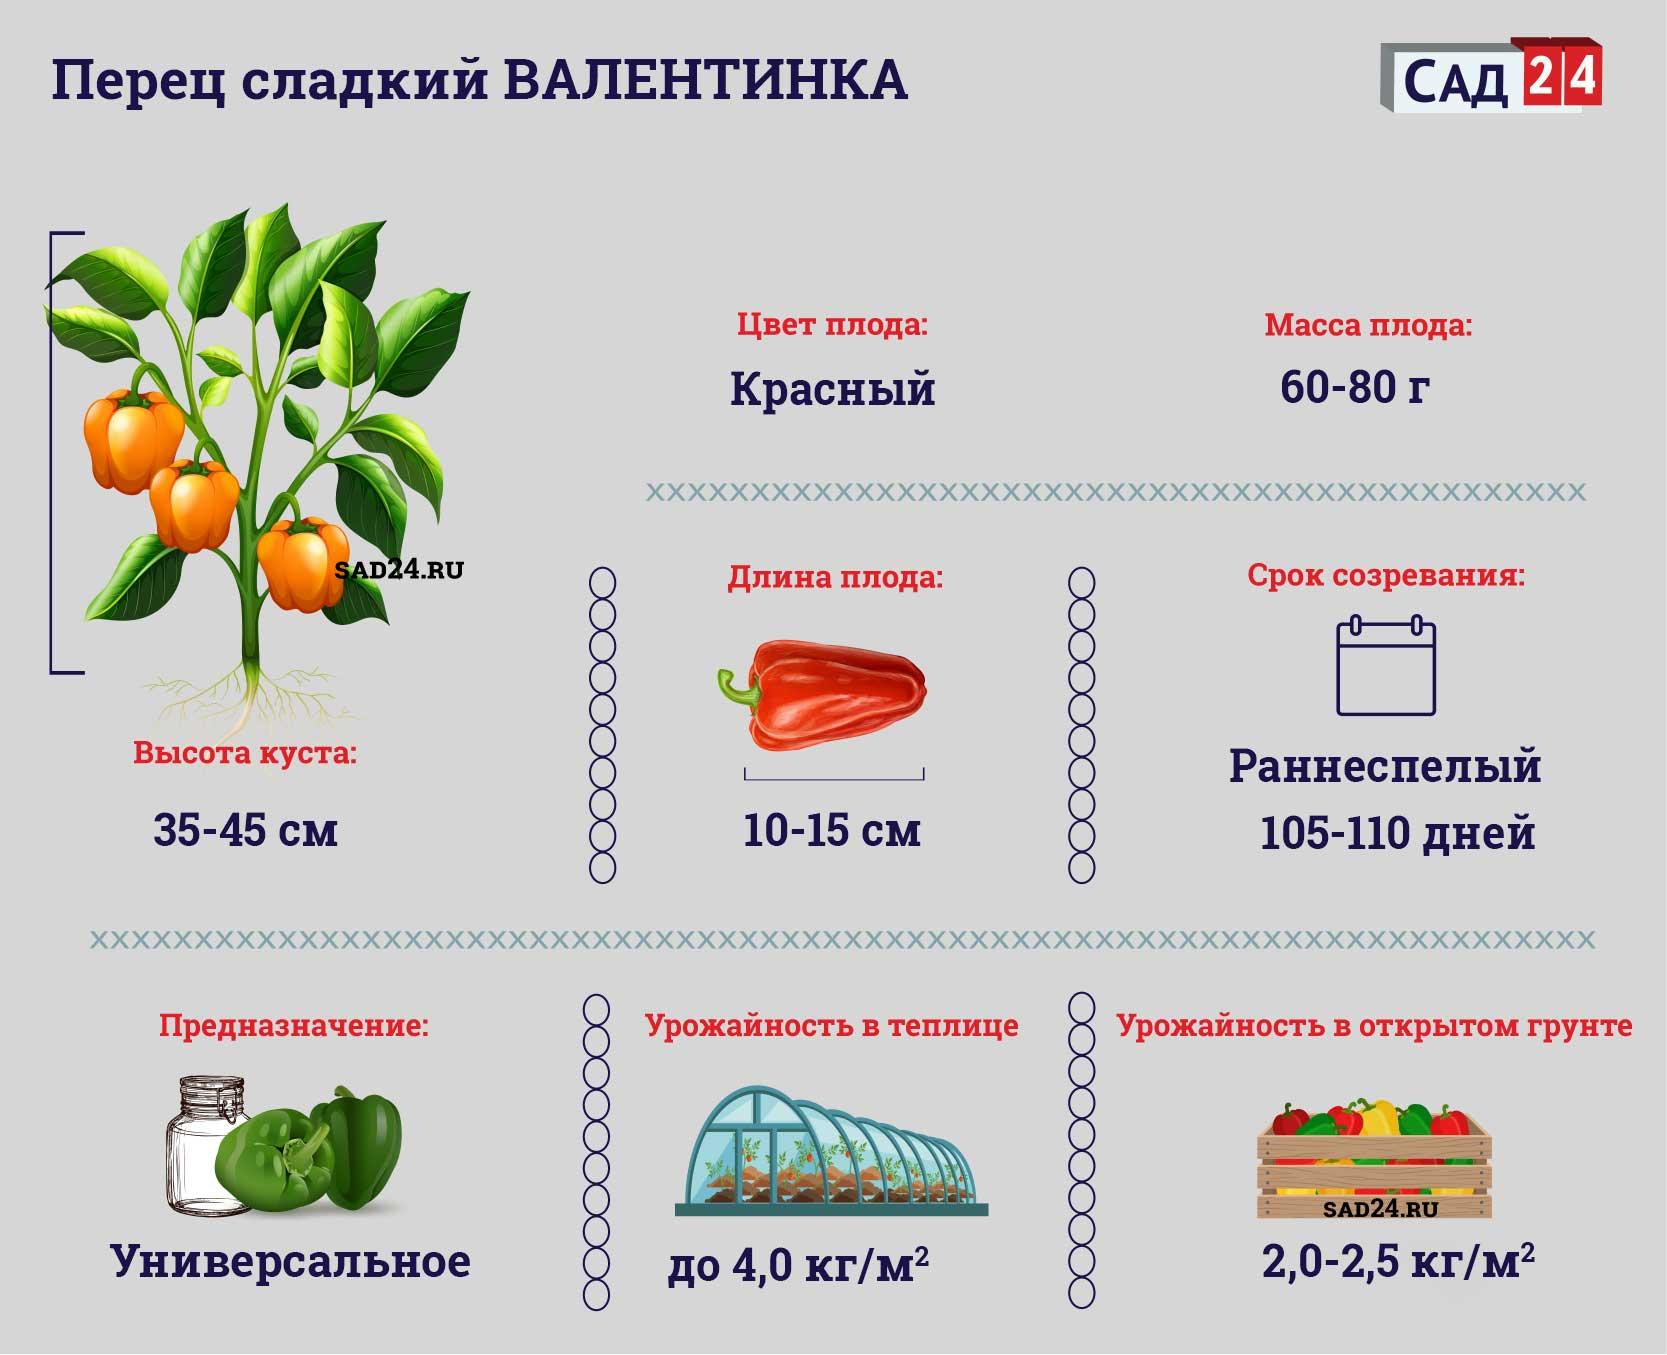 Валентинка  - https://sad24.ru